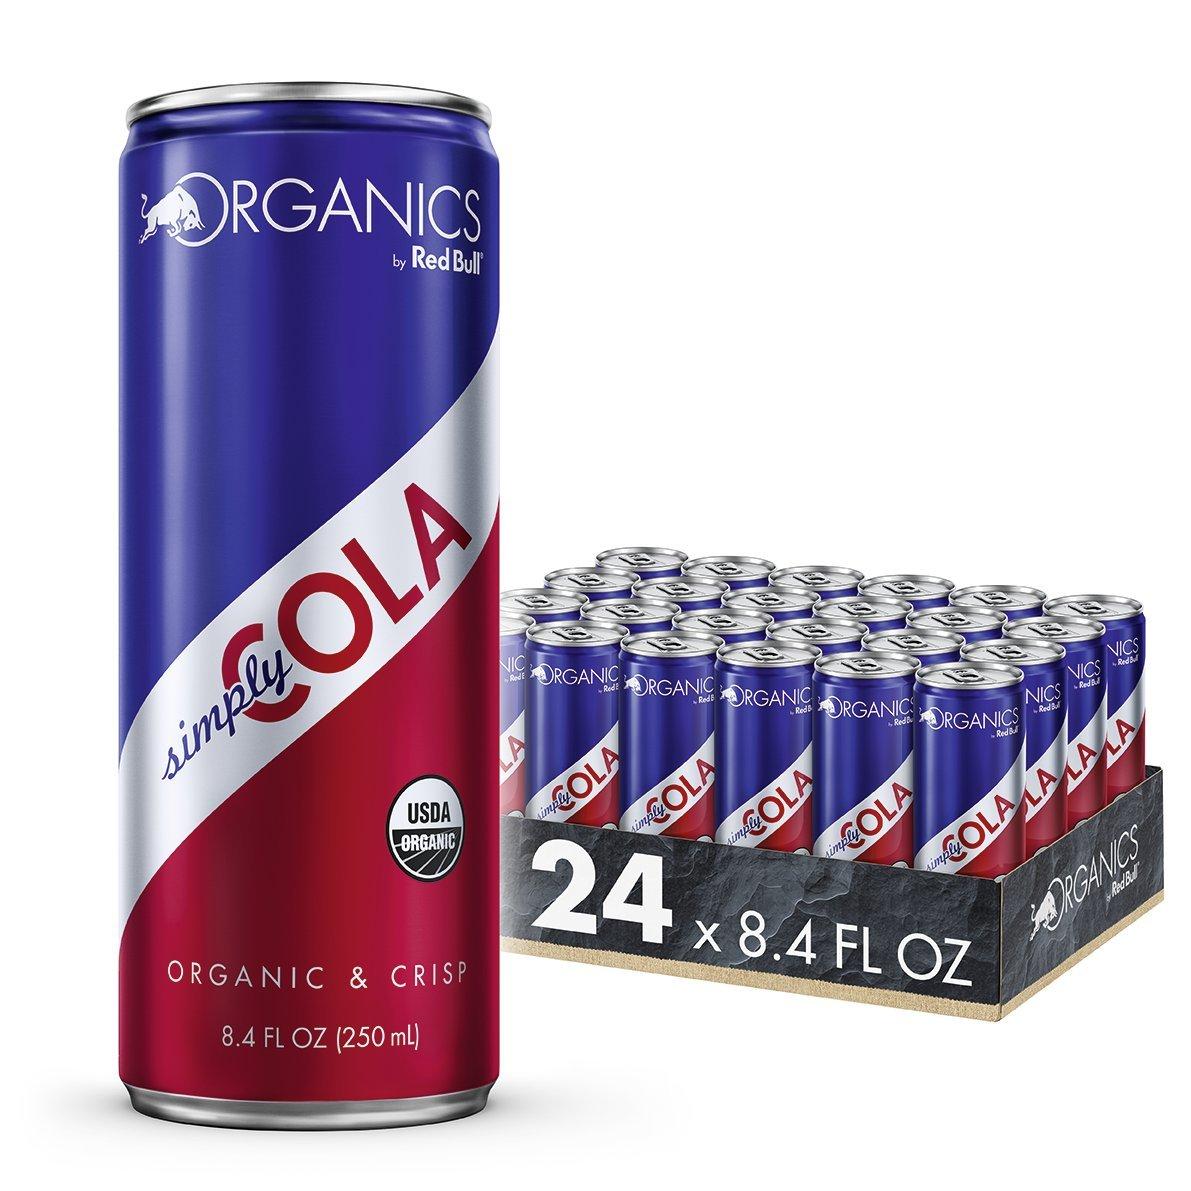 Organics by Red Bull Simply Cola 24 Pack of 8.4 Fl Oz, Organic Soda Drink